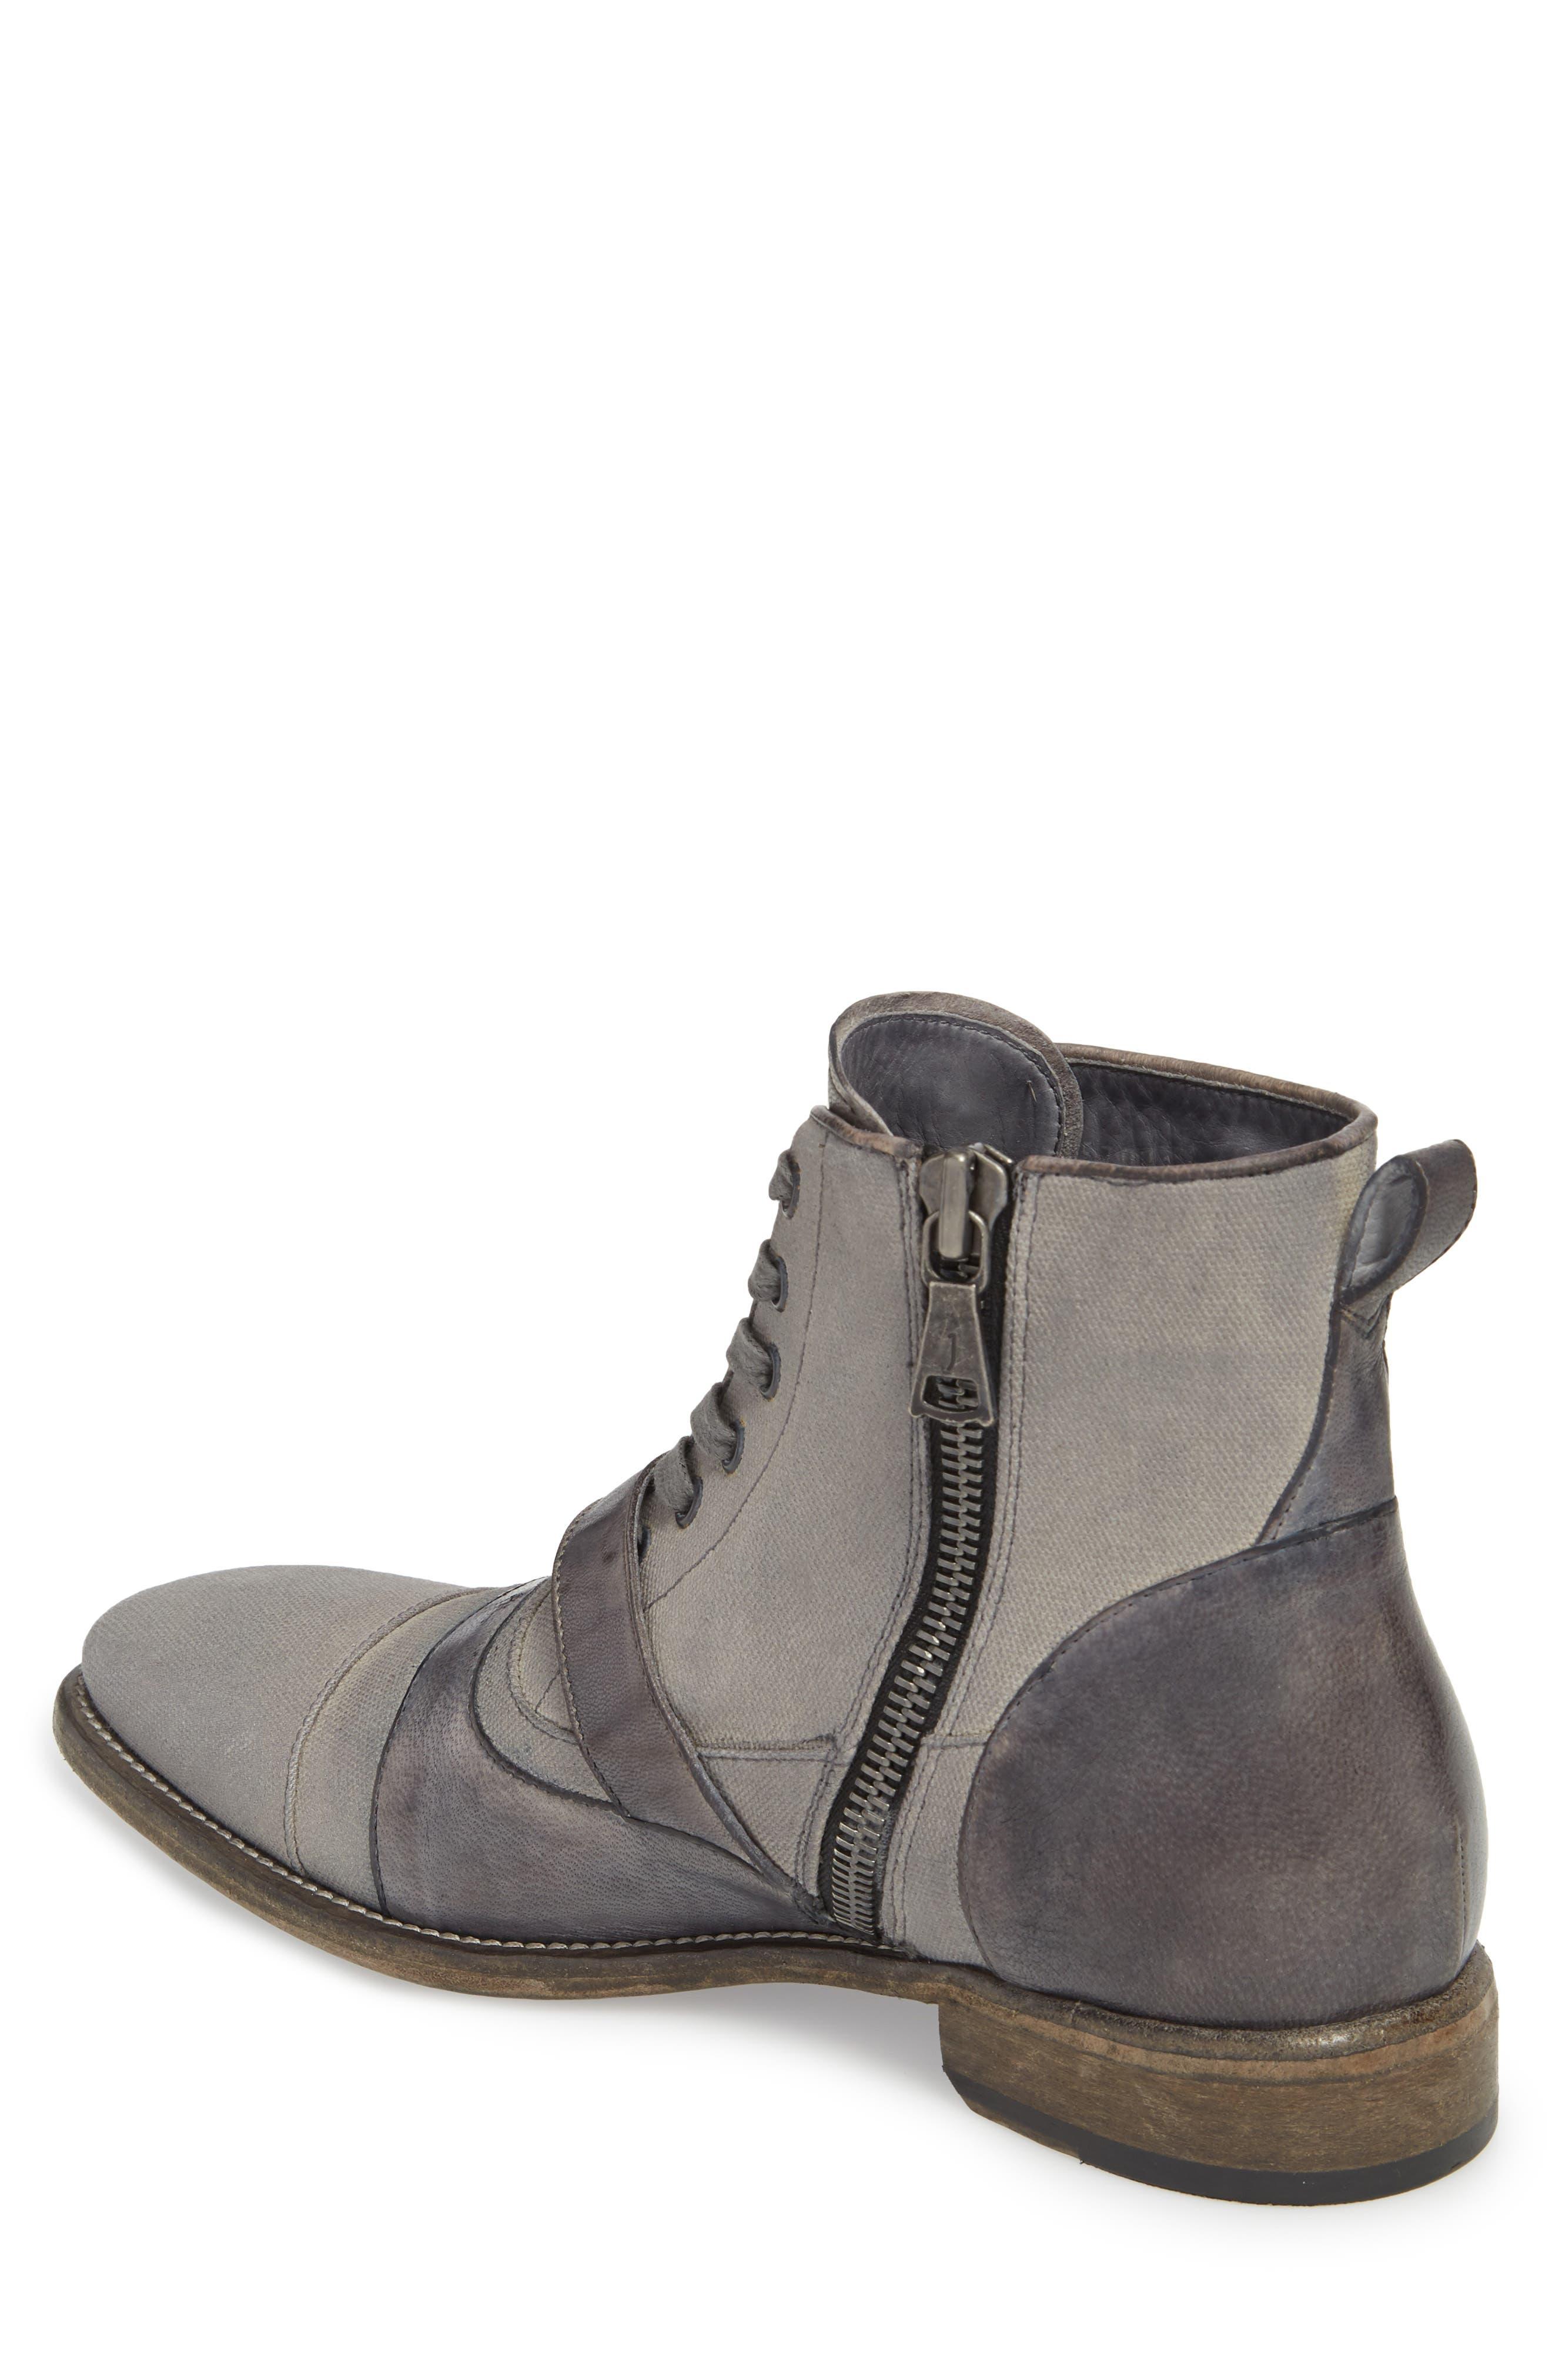 John Varvatos Fleetwood Buckle Cricket Boot,                             Alternate thumbnail 2, color,